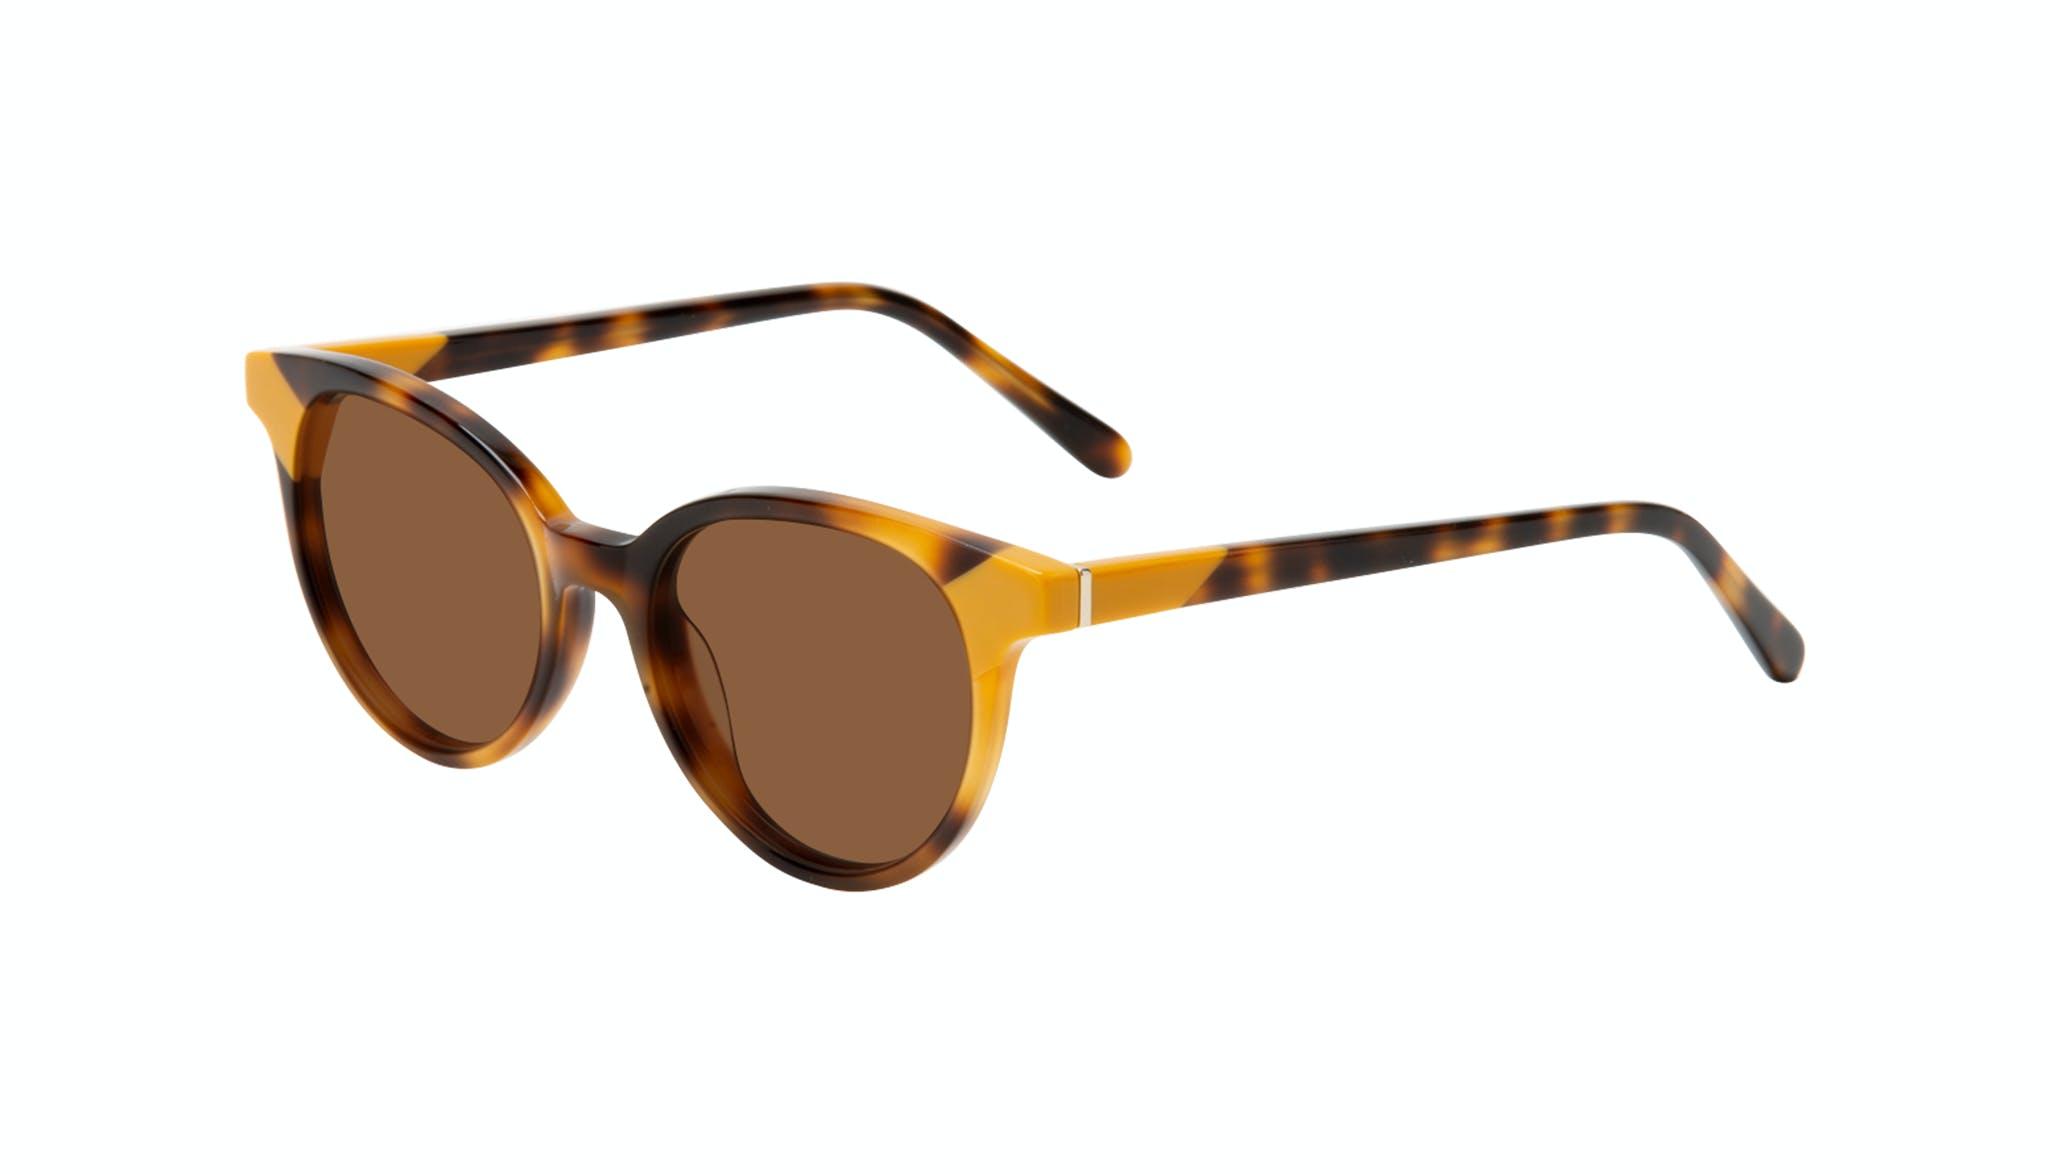 Affordable Fashion Glasses Round Sunglasses Women Bright Yellow Pop Tilt